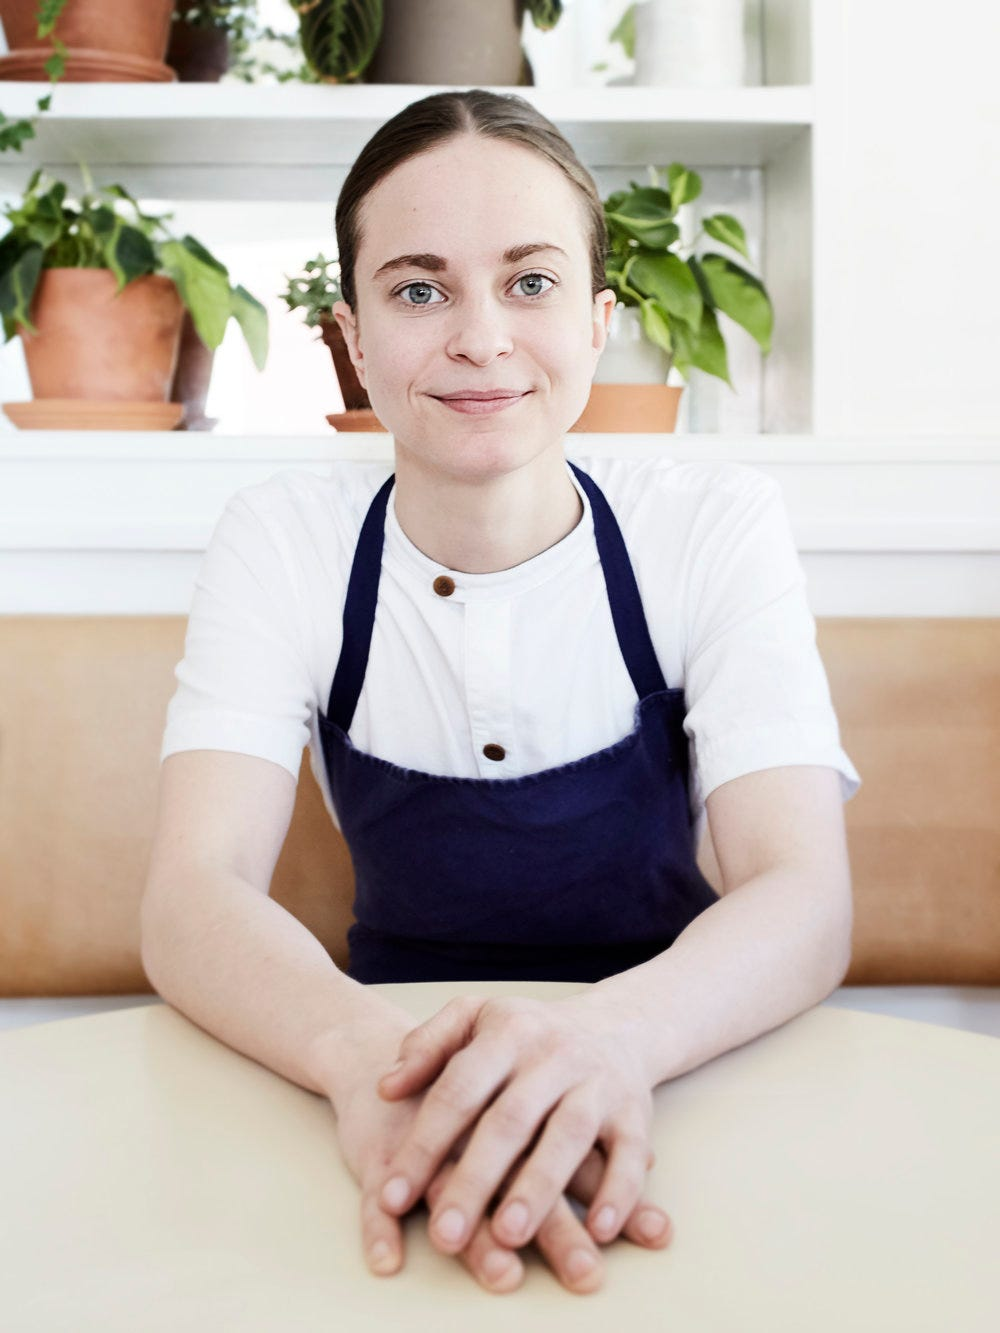 Female Chef Recommendations For Women-Led Restaurants